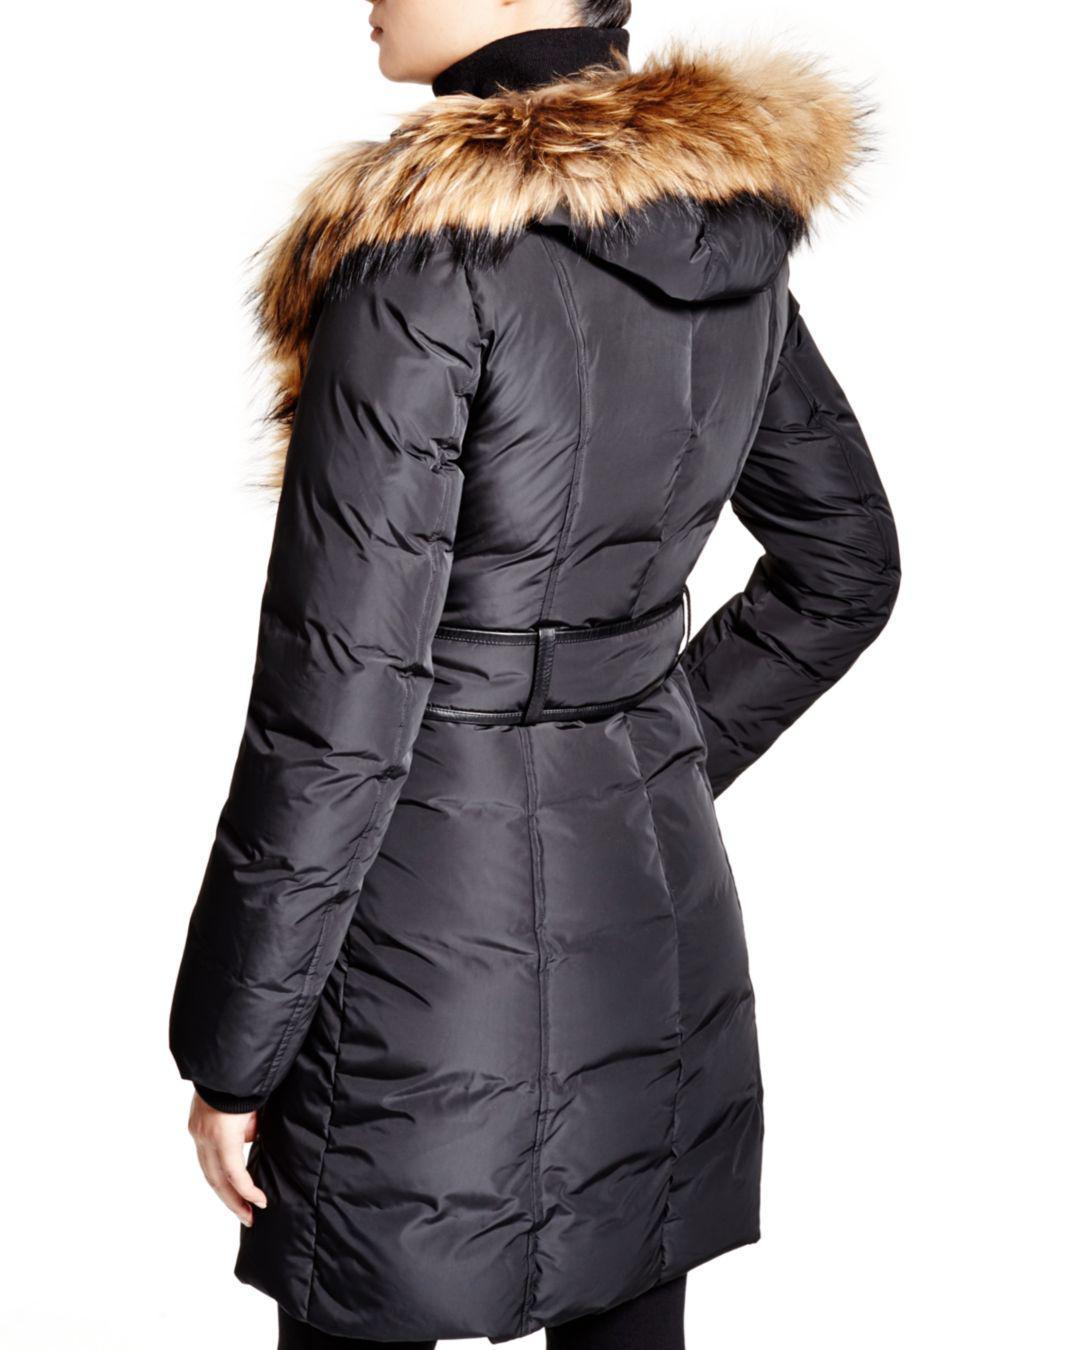 29e4675d8e6b Lyst - Mackage Kay Lavish Fur Trim Down Coat in Gray - Save 50%